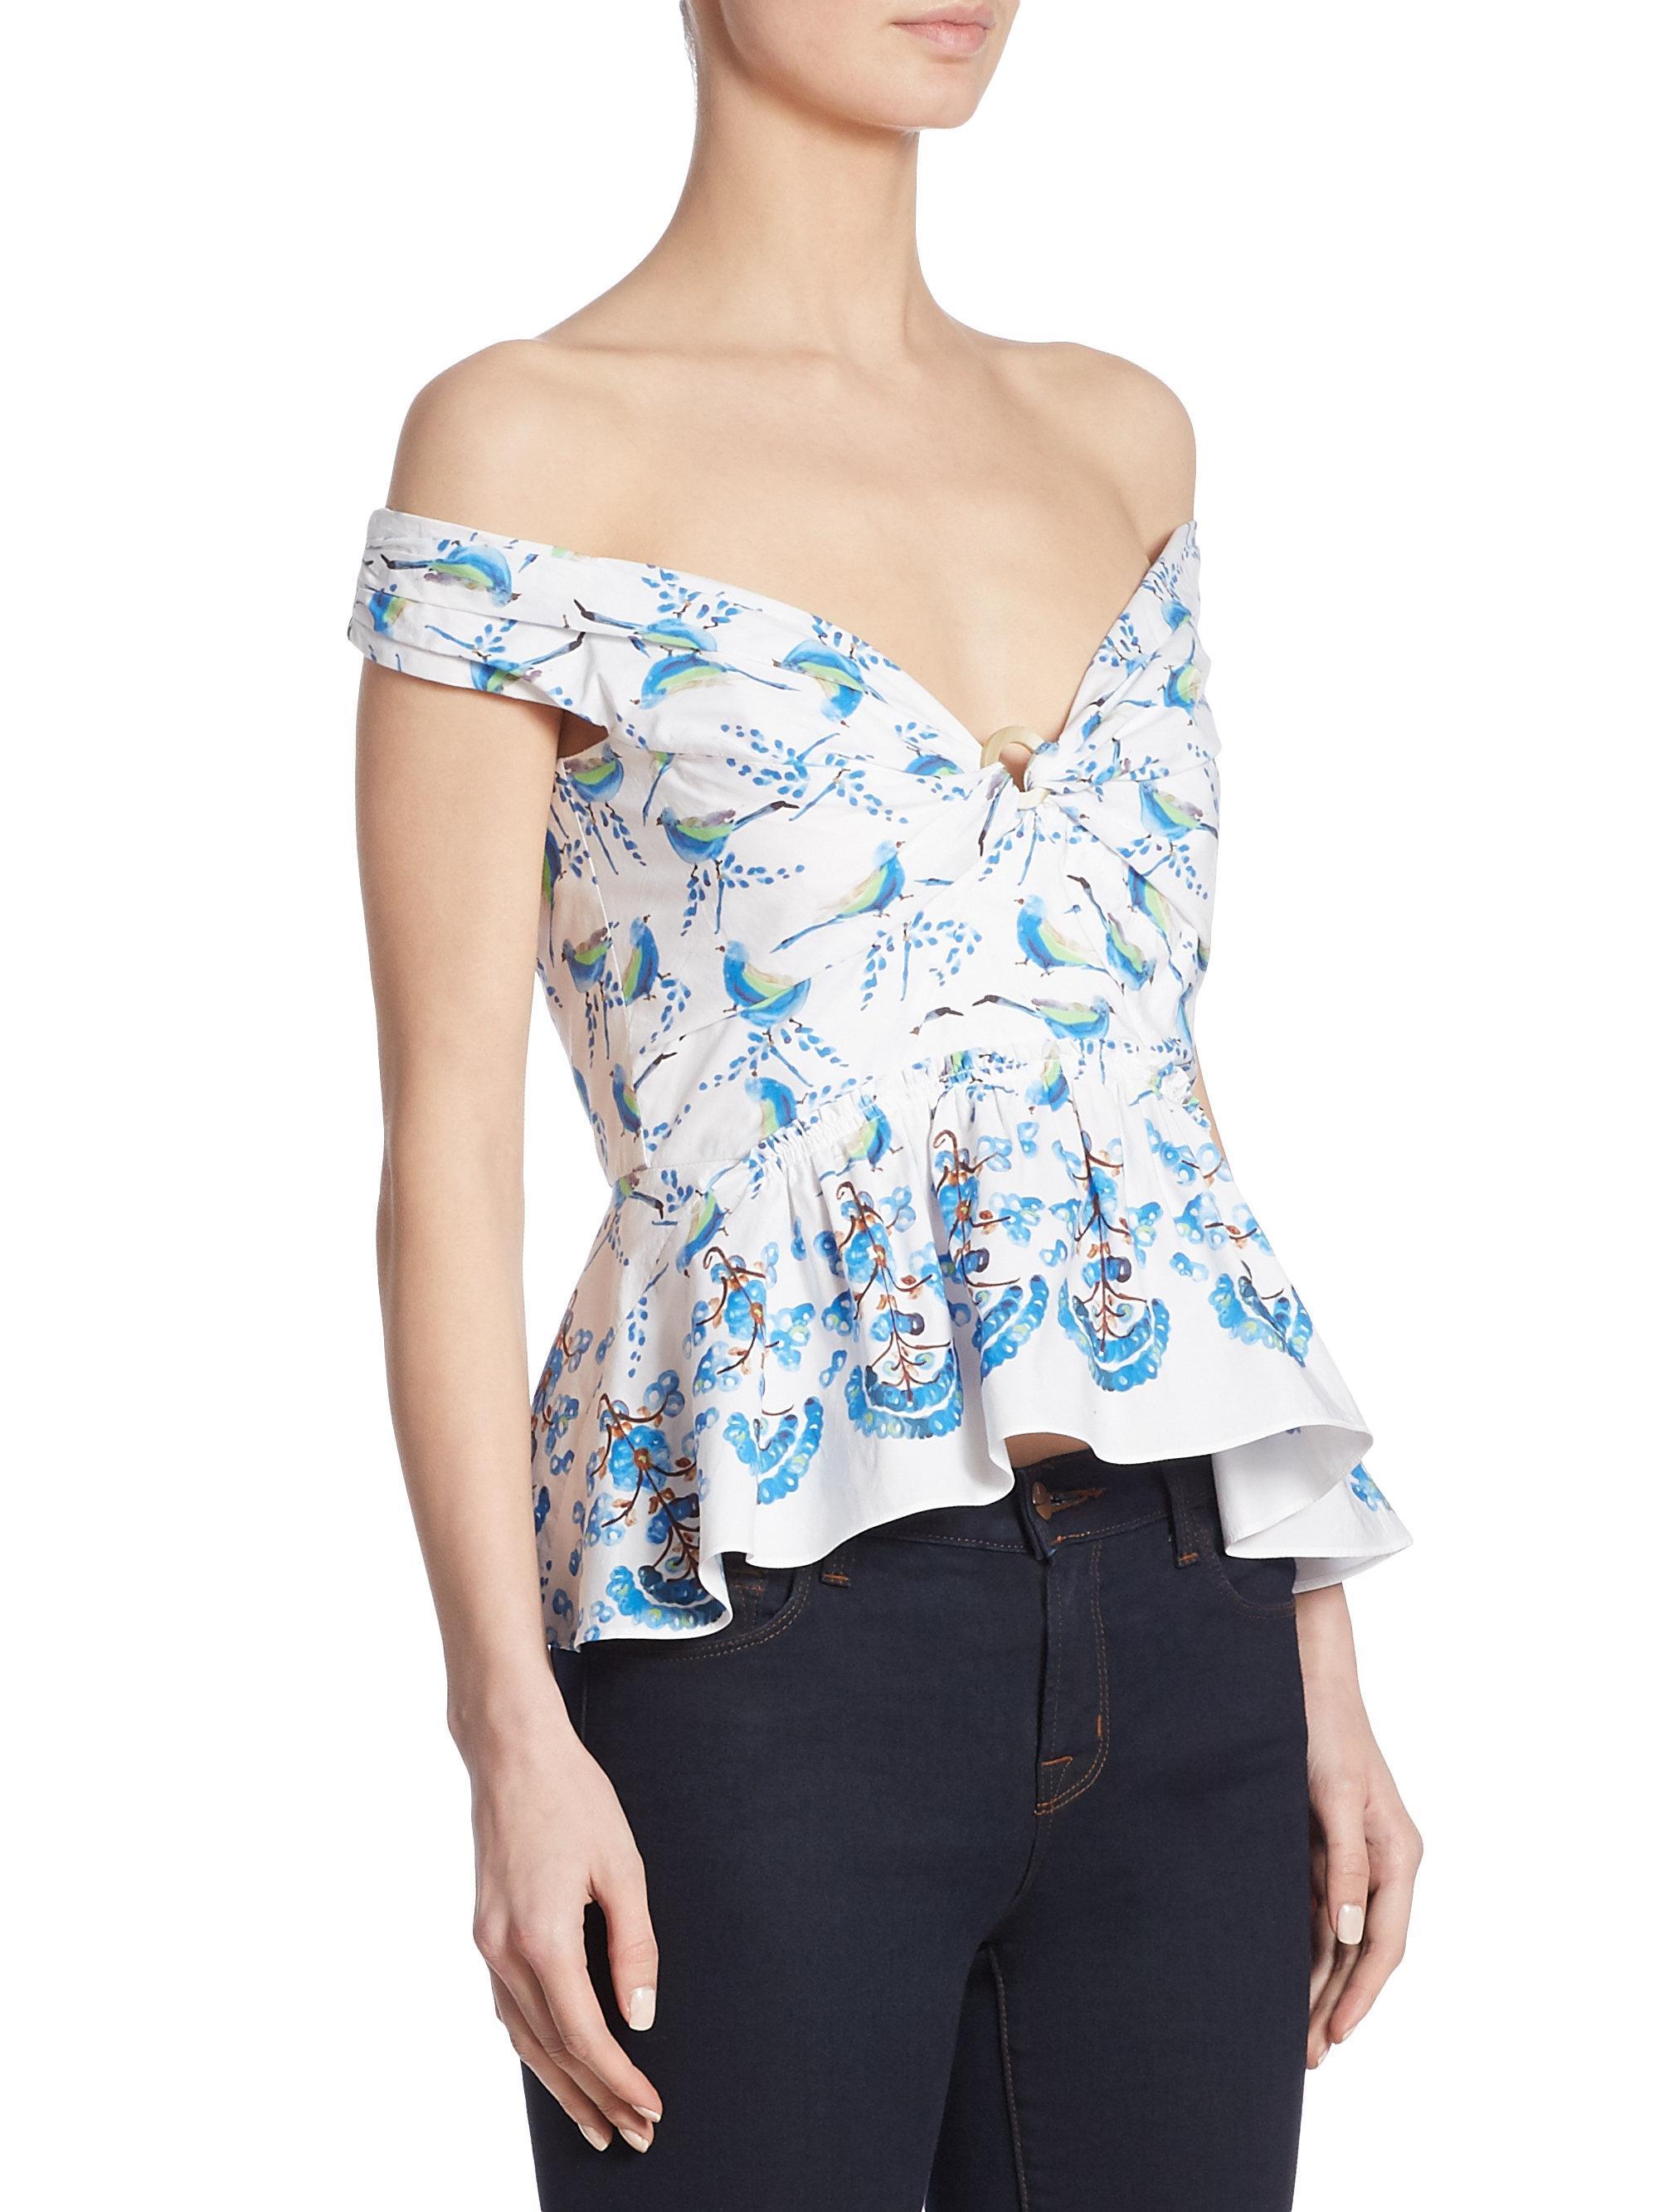 Ebay For Sale Discount Great Deals Peter Pilotto Woman Off-the-shoulder Cotton-poplin Peplum Top Turquoise Size 12 Peter Pilotto 2018 New Cheap Online Discount Factory Outlet LGUTS